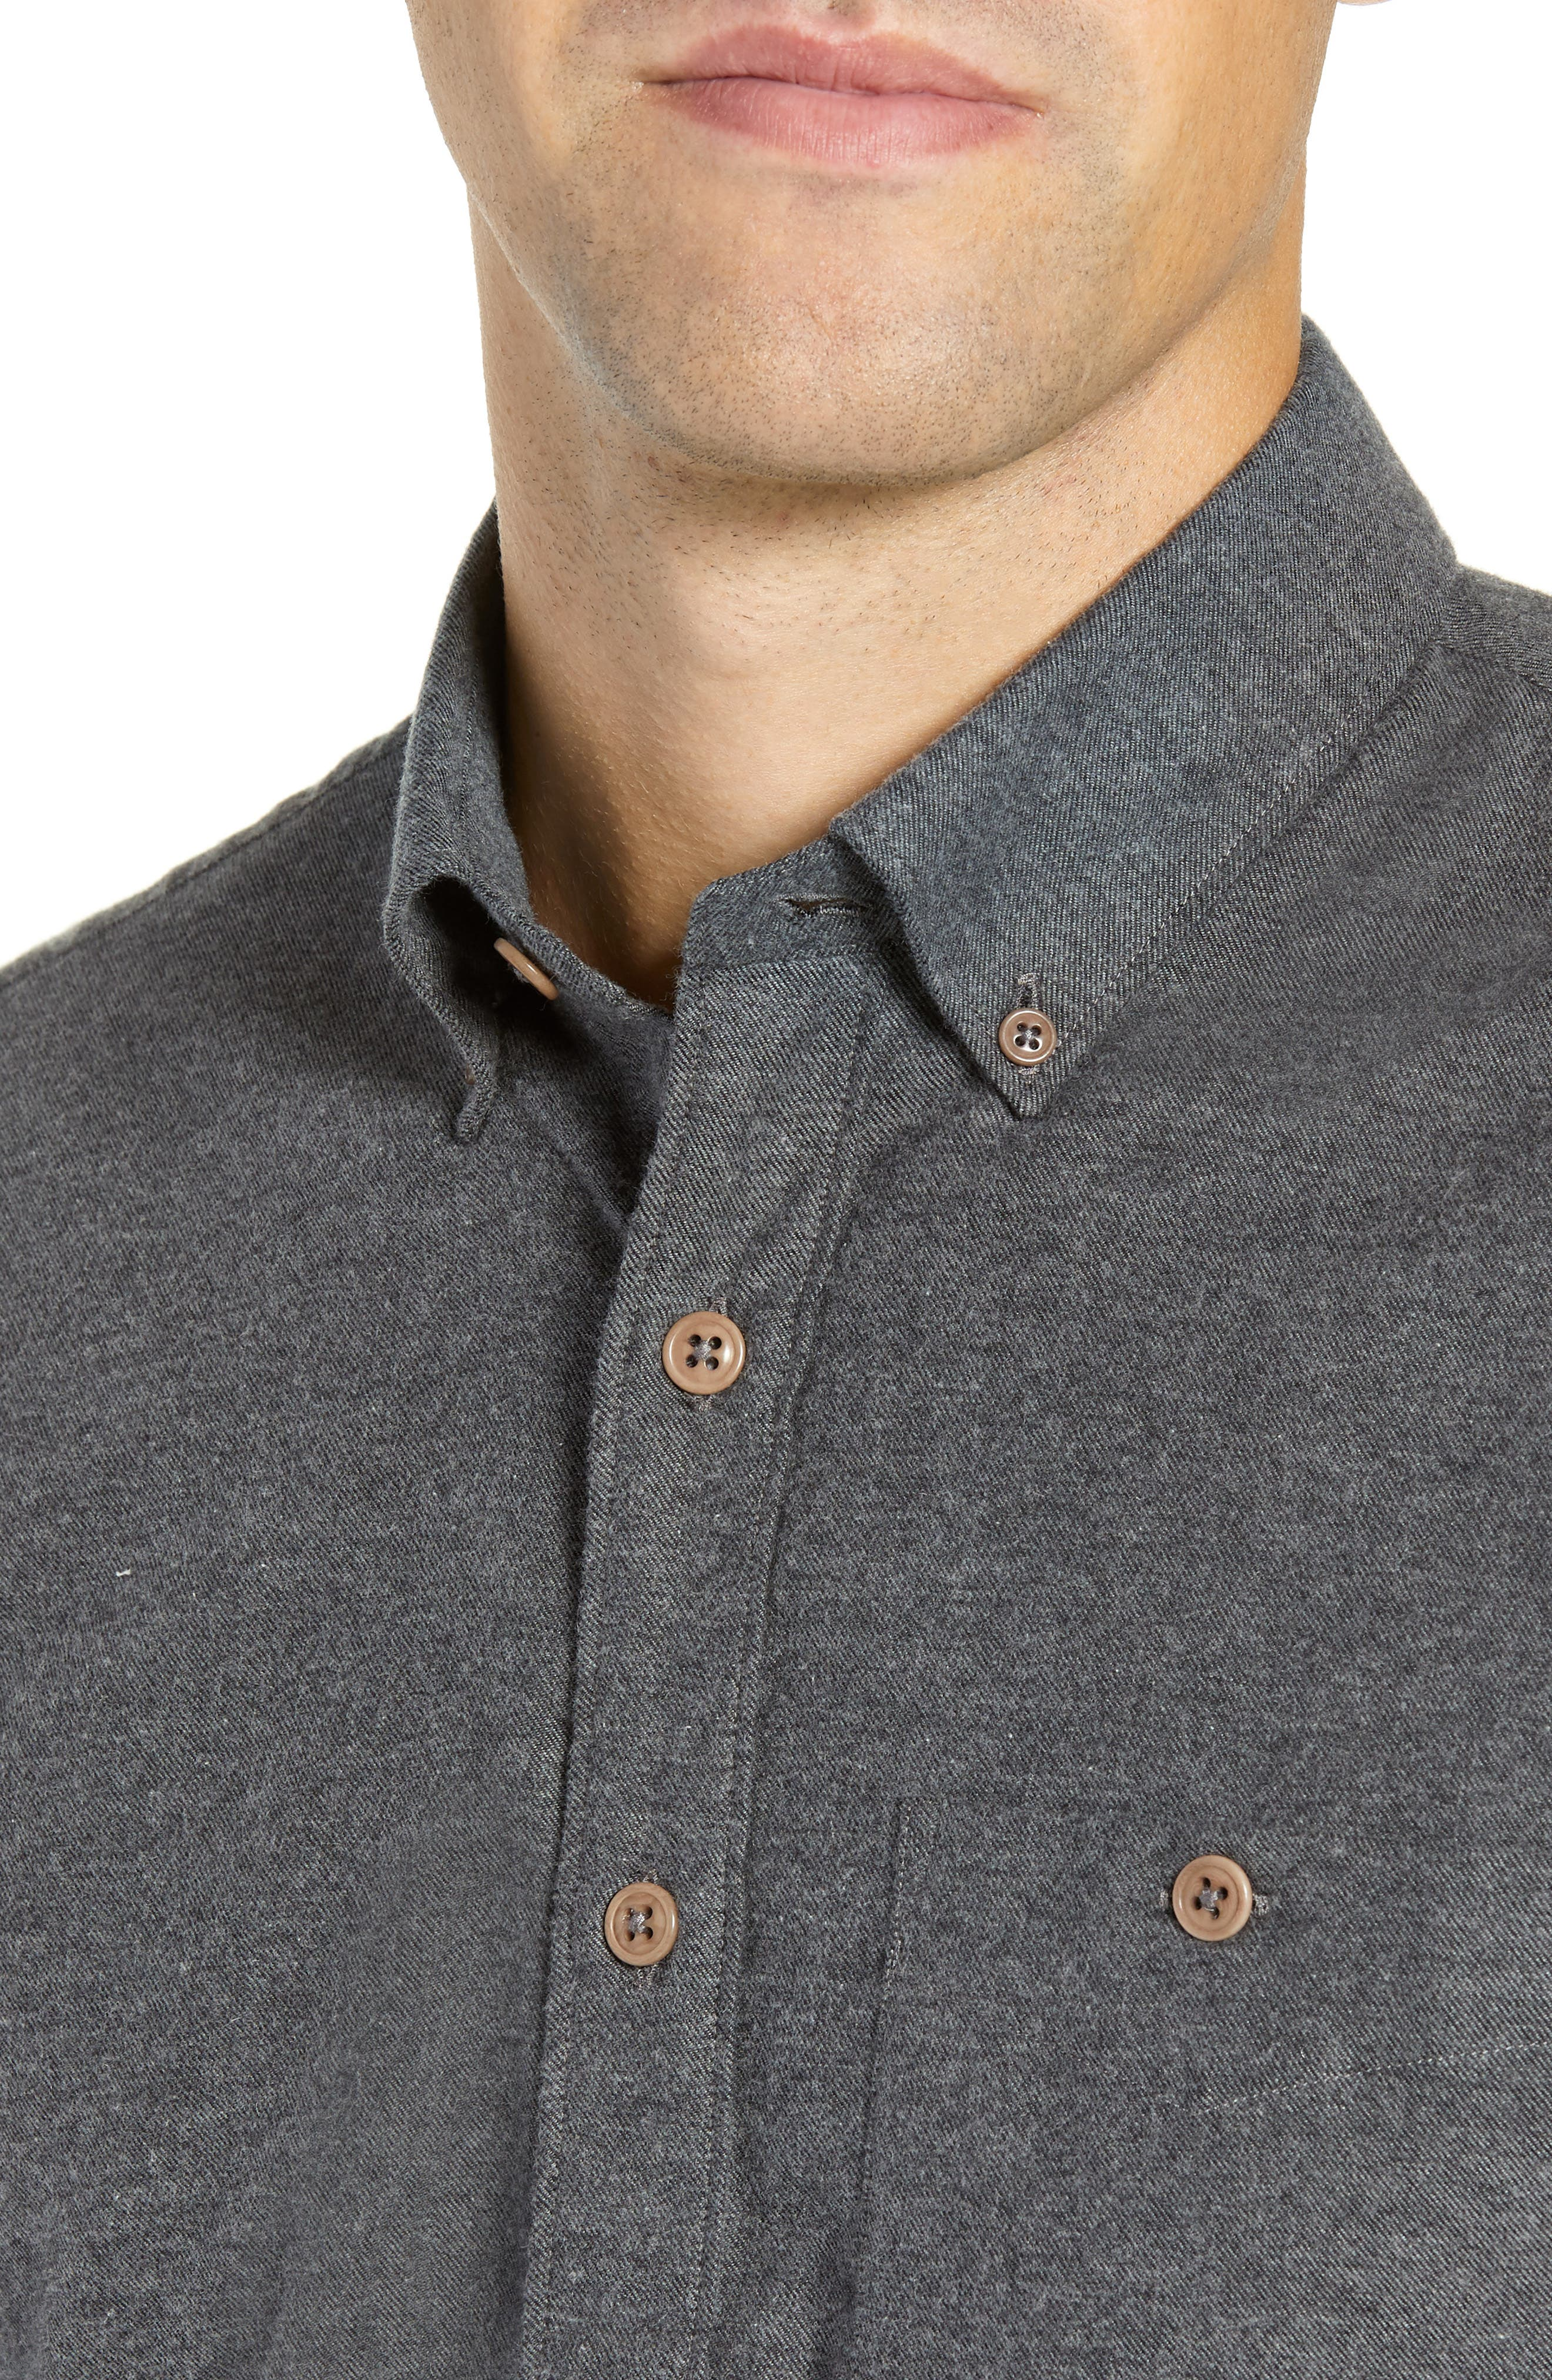 Brushed Cotton & Cashmere Twill Sport Shirt,                             Alternate thumbnail 2, color,                             020